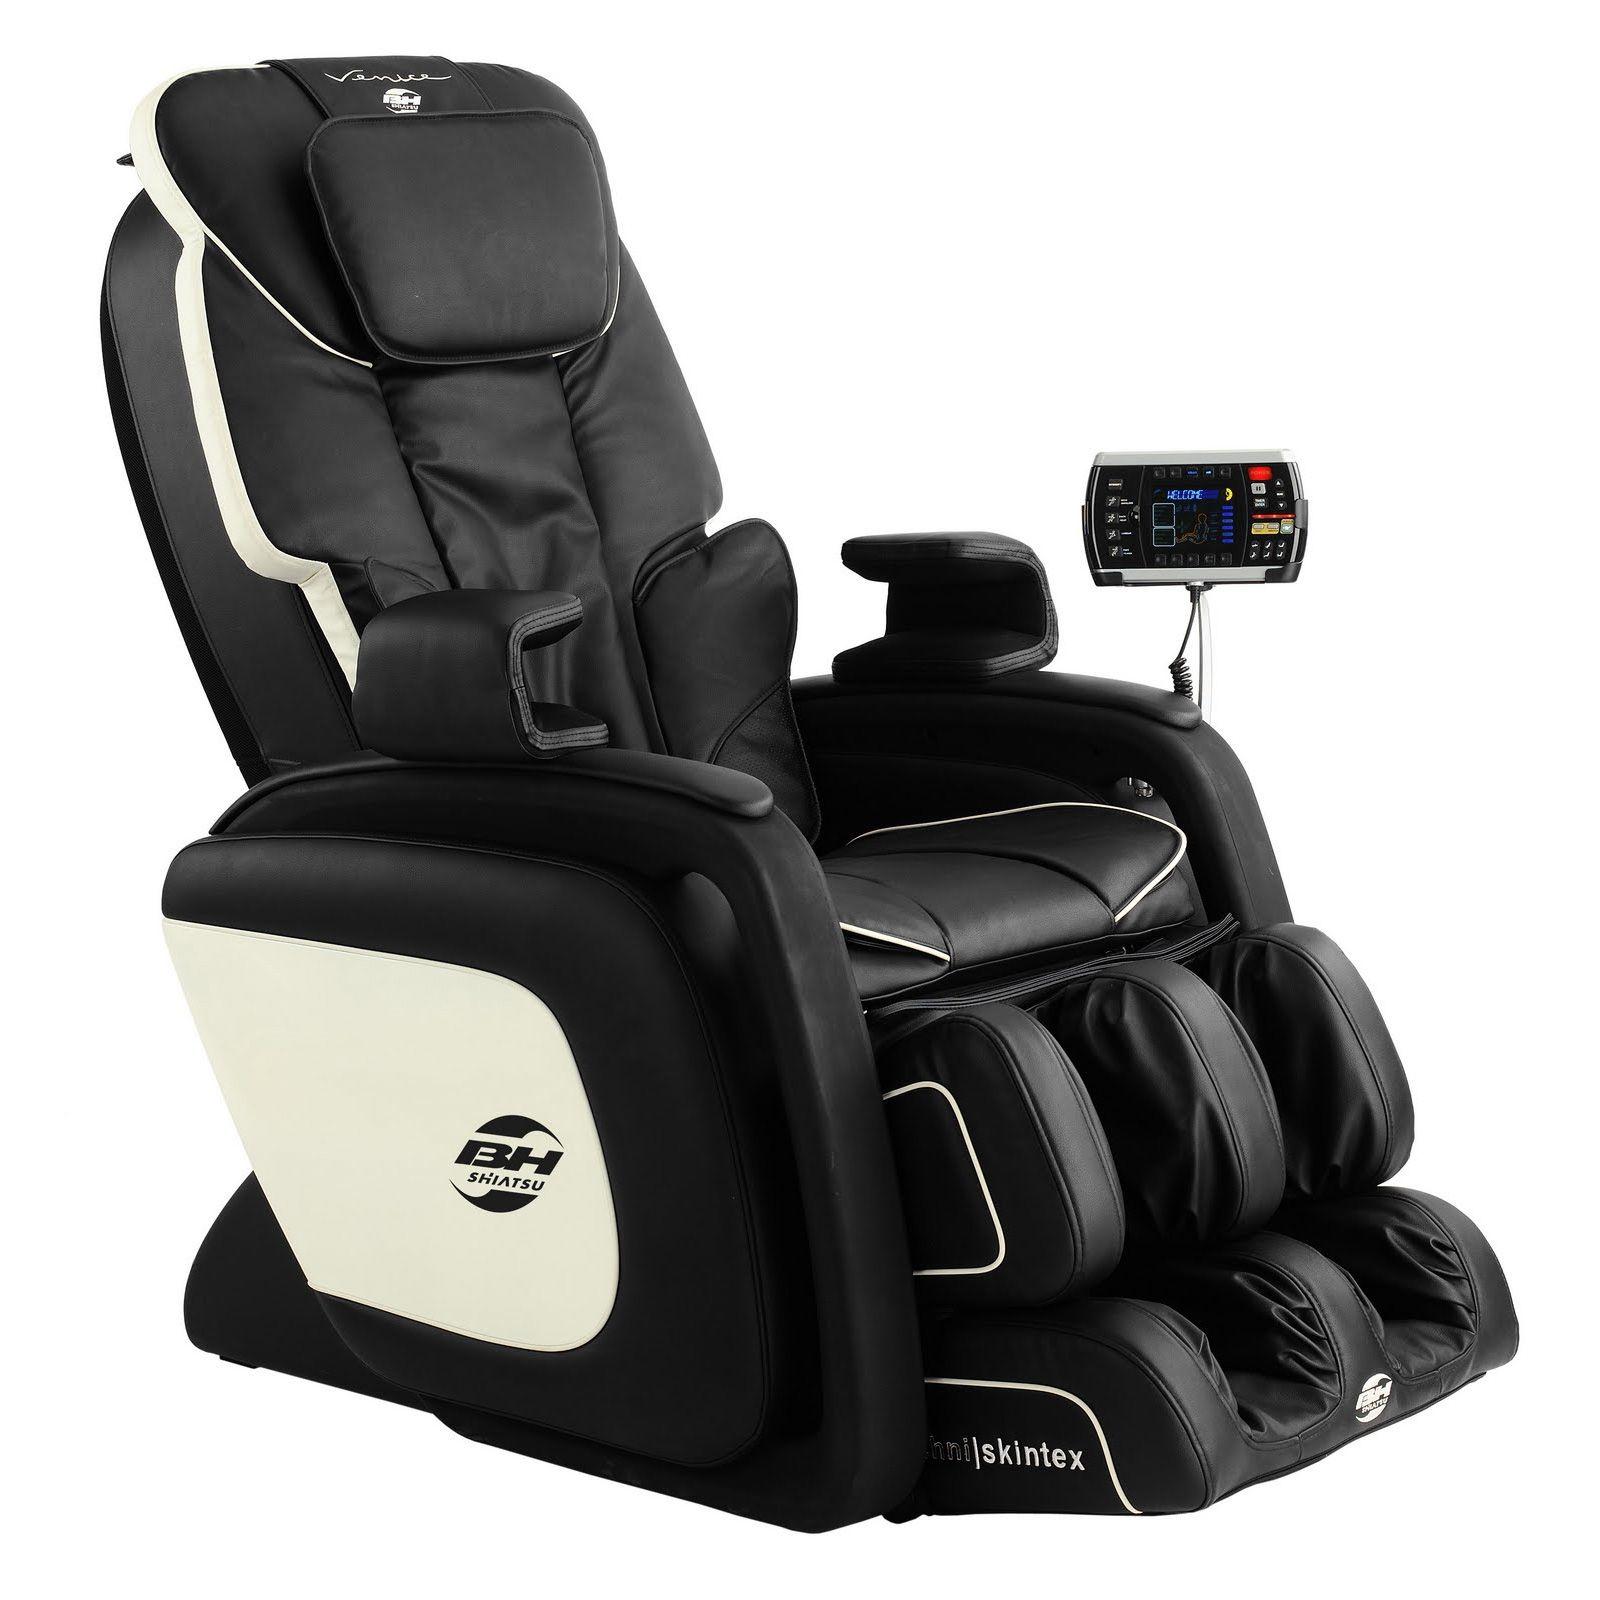 Bh Shiatsu M650 Venice Massage Chair Sweatband Com